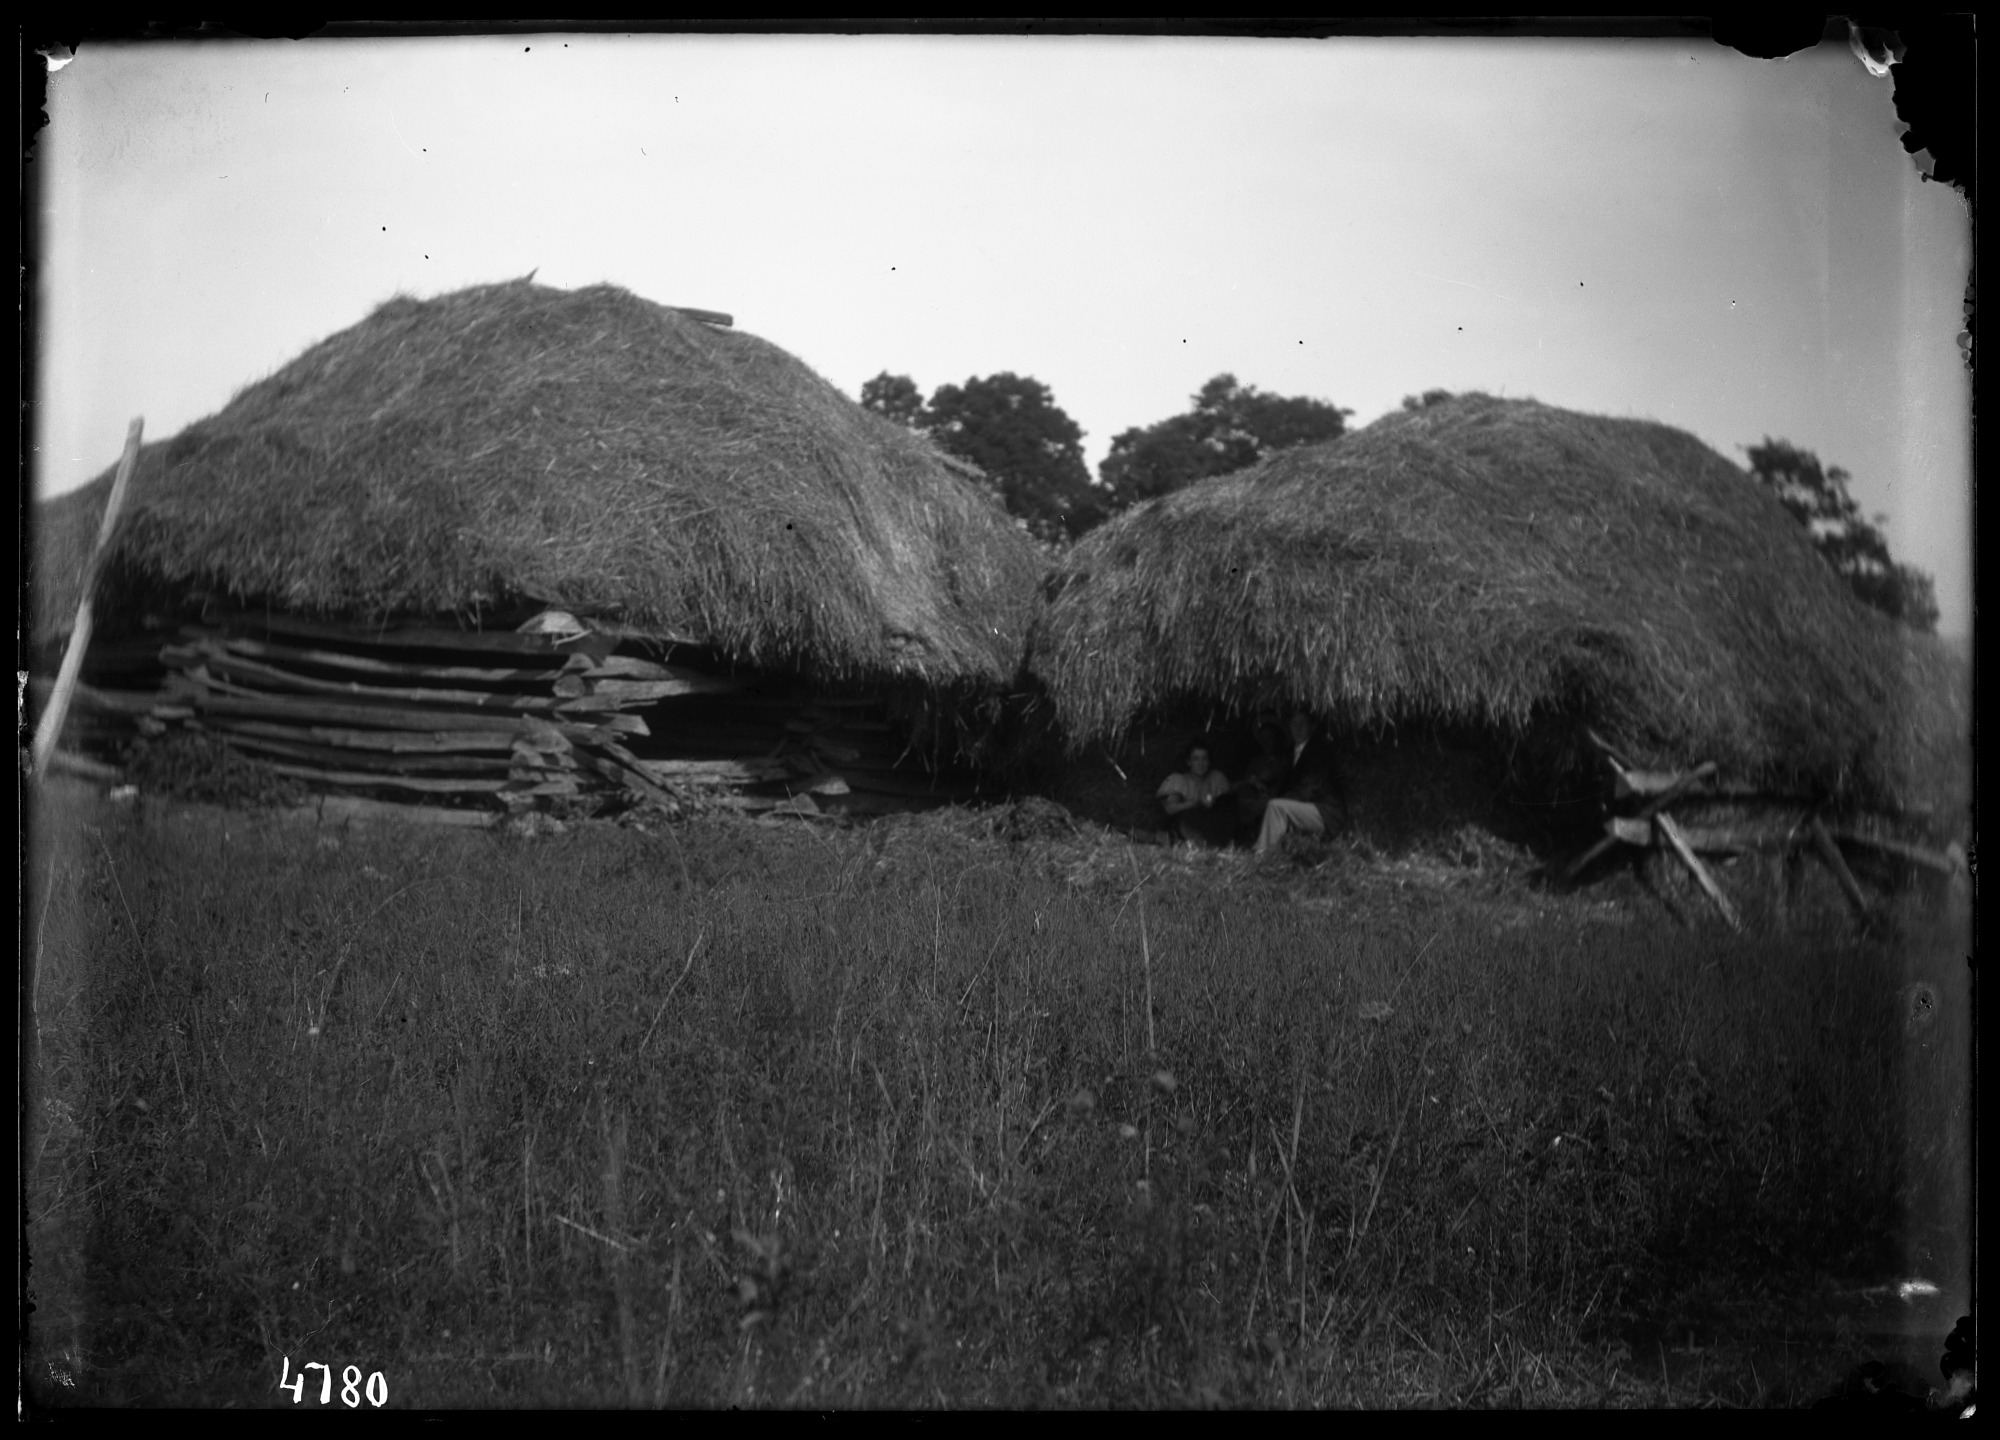 Unidentified Farm, 1880, Smithsonian Institution Archives, SIA Acc. 11-006 [MAH-4780].